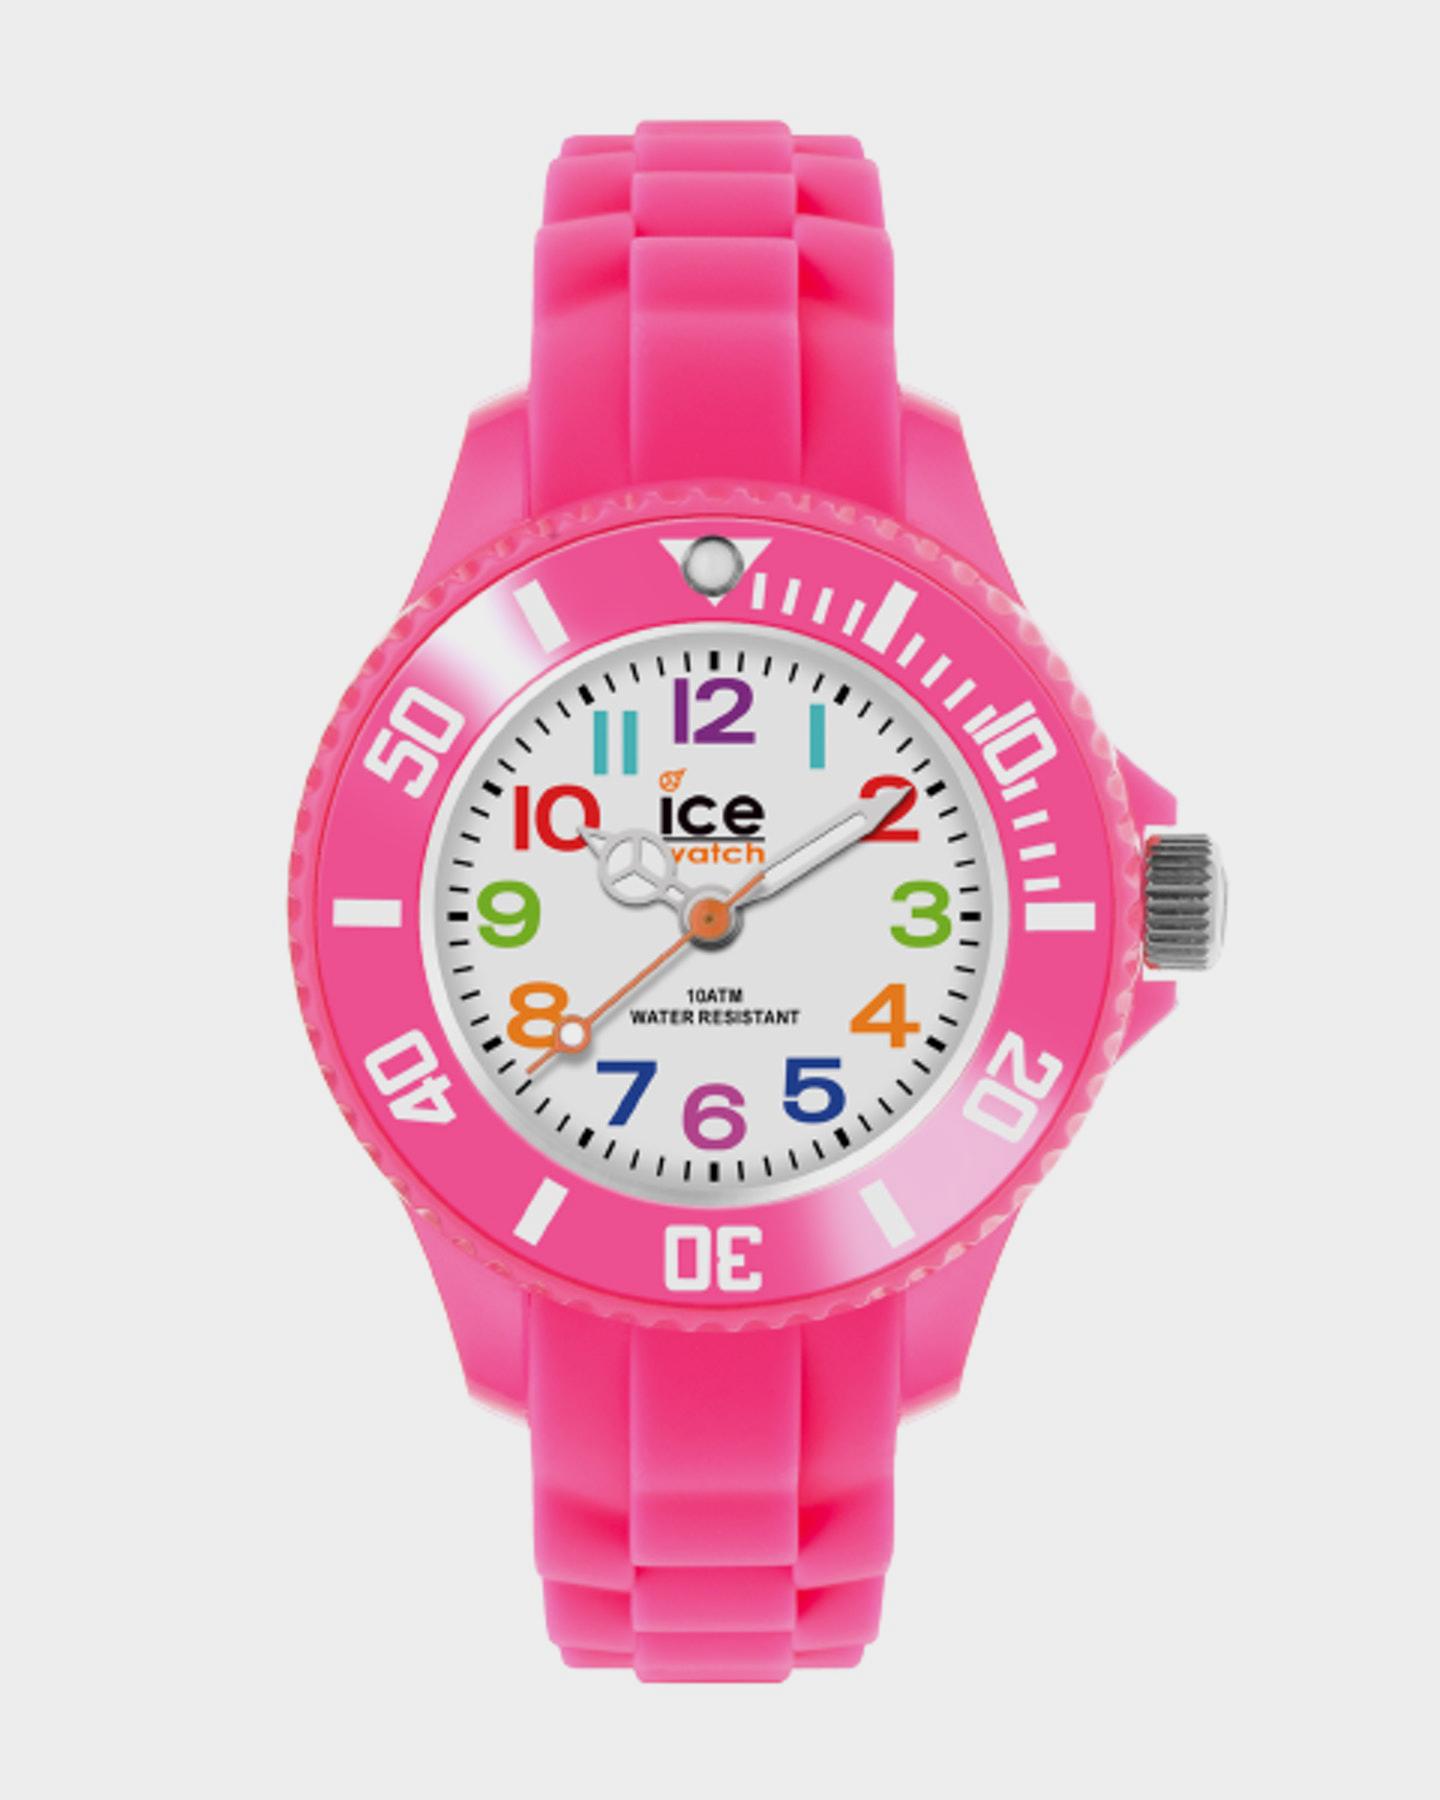 Ice Watch Ice Mini Watch - Extra Small Pink